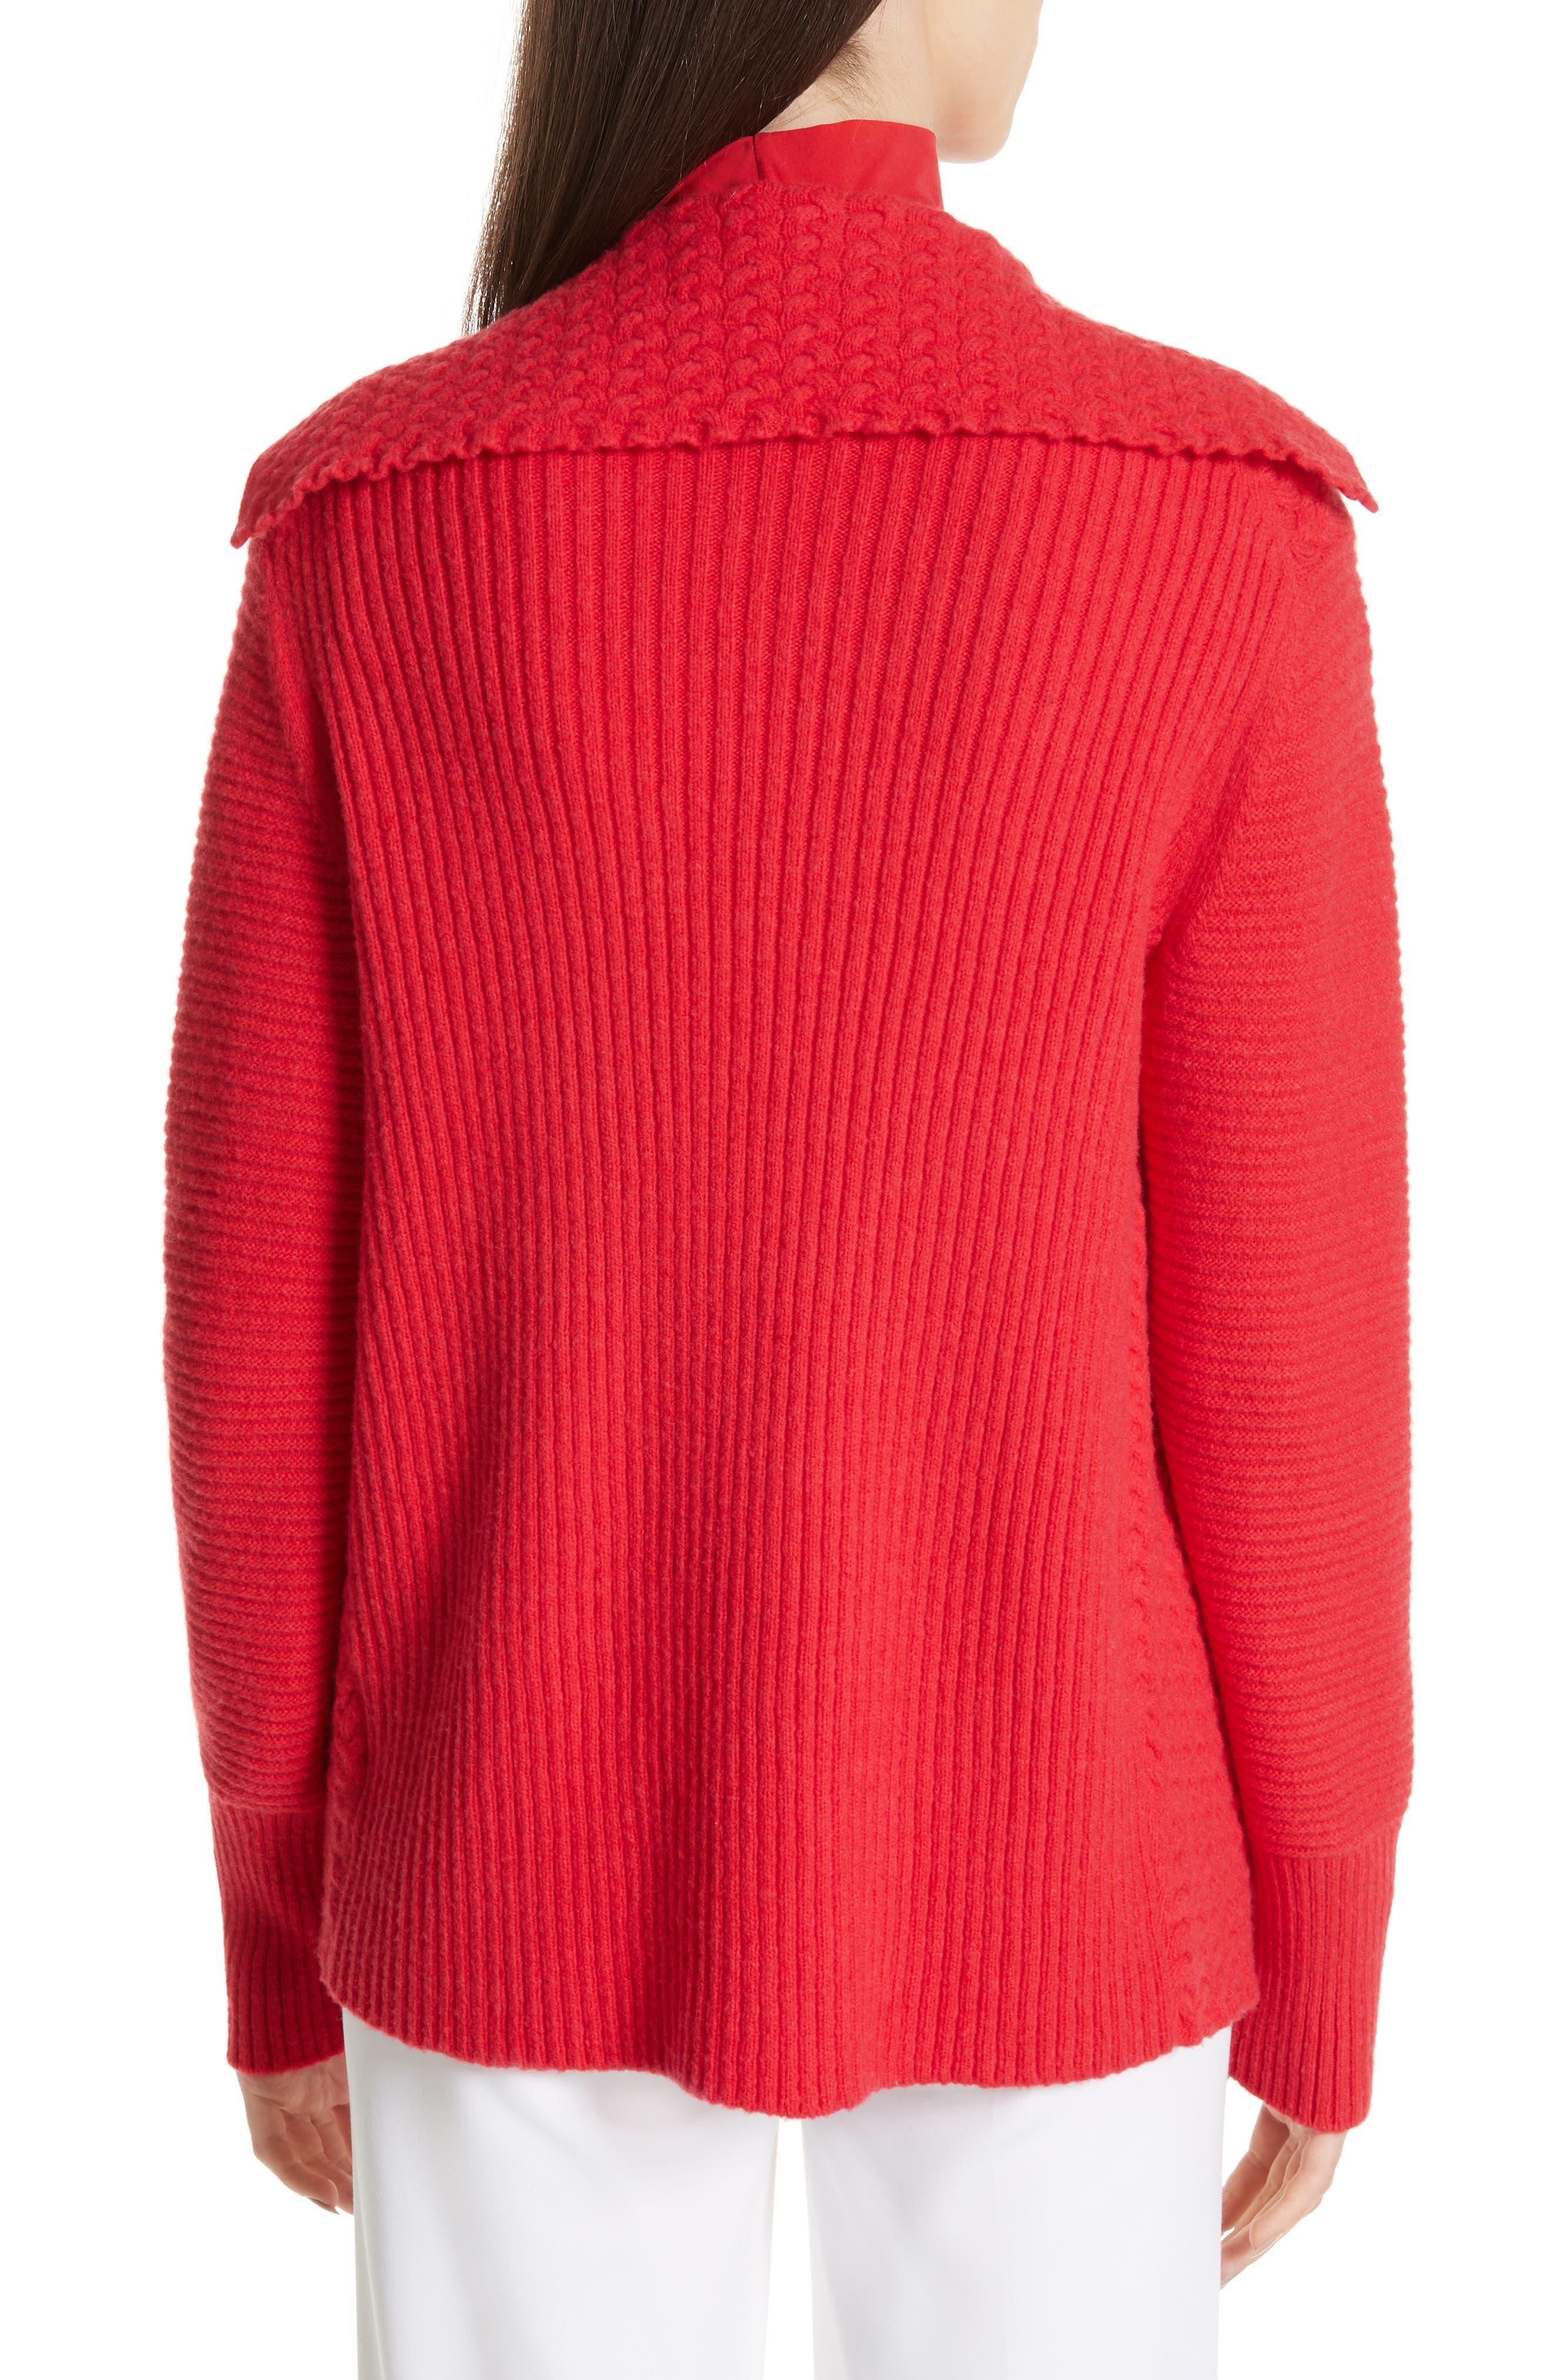 ST. JOHN COLLECTION, Cable Knit Cardigan, Alternate thumbnail 2, color, CRIMSON